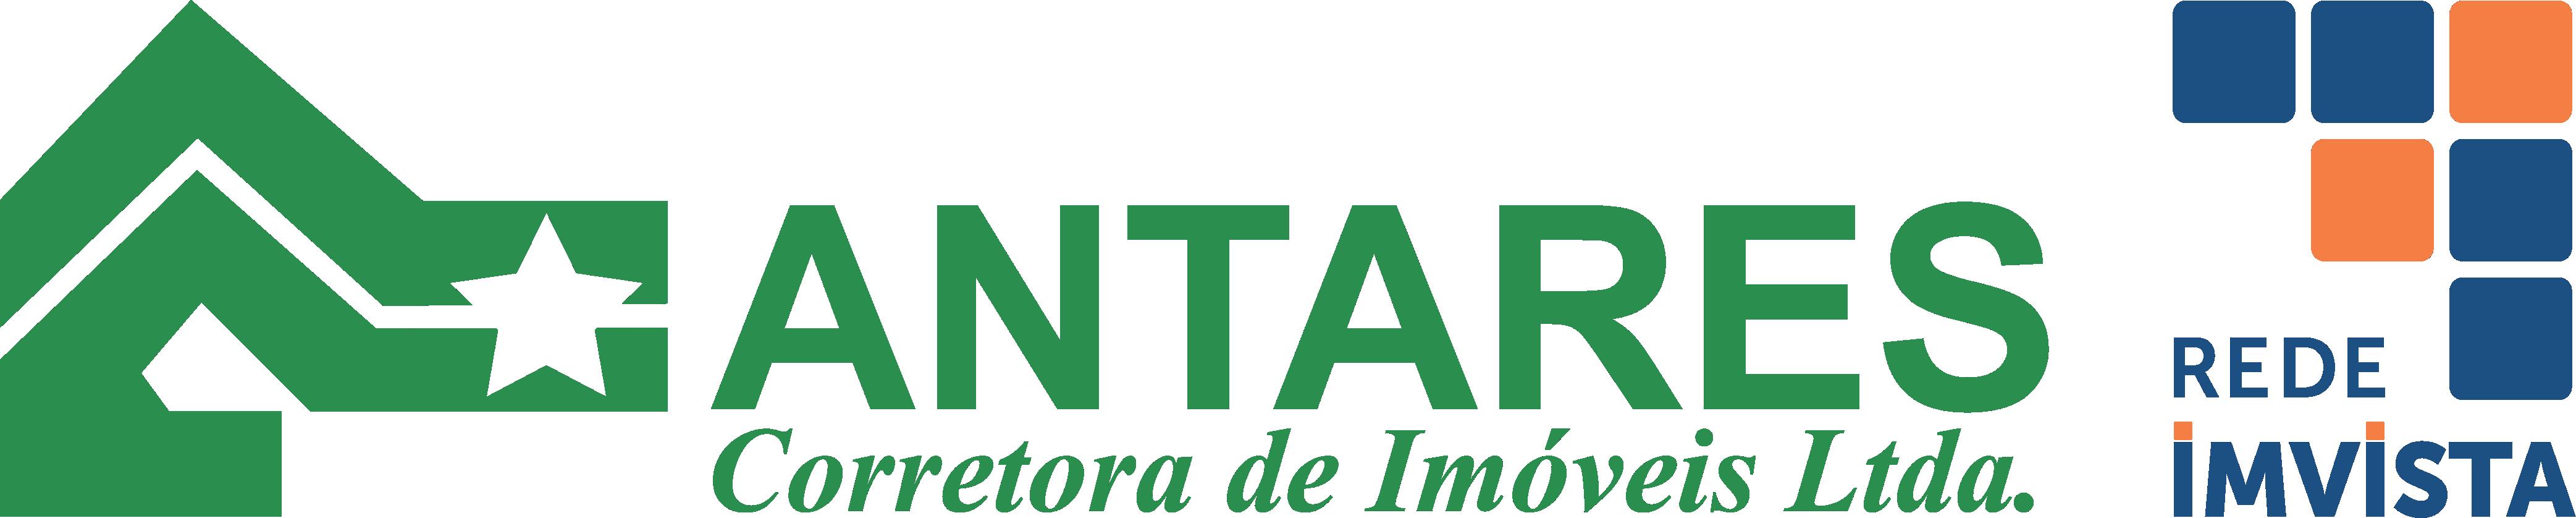 Logotipo ANTARES IMÓVEIS